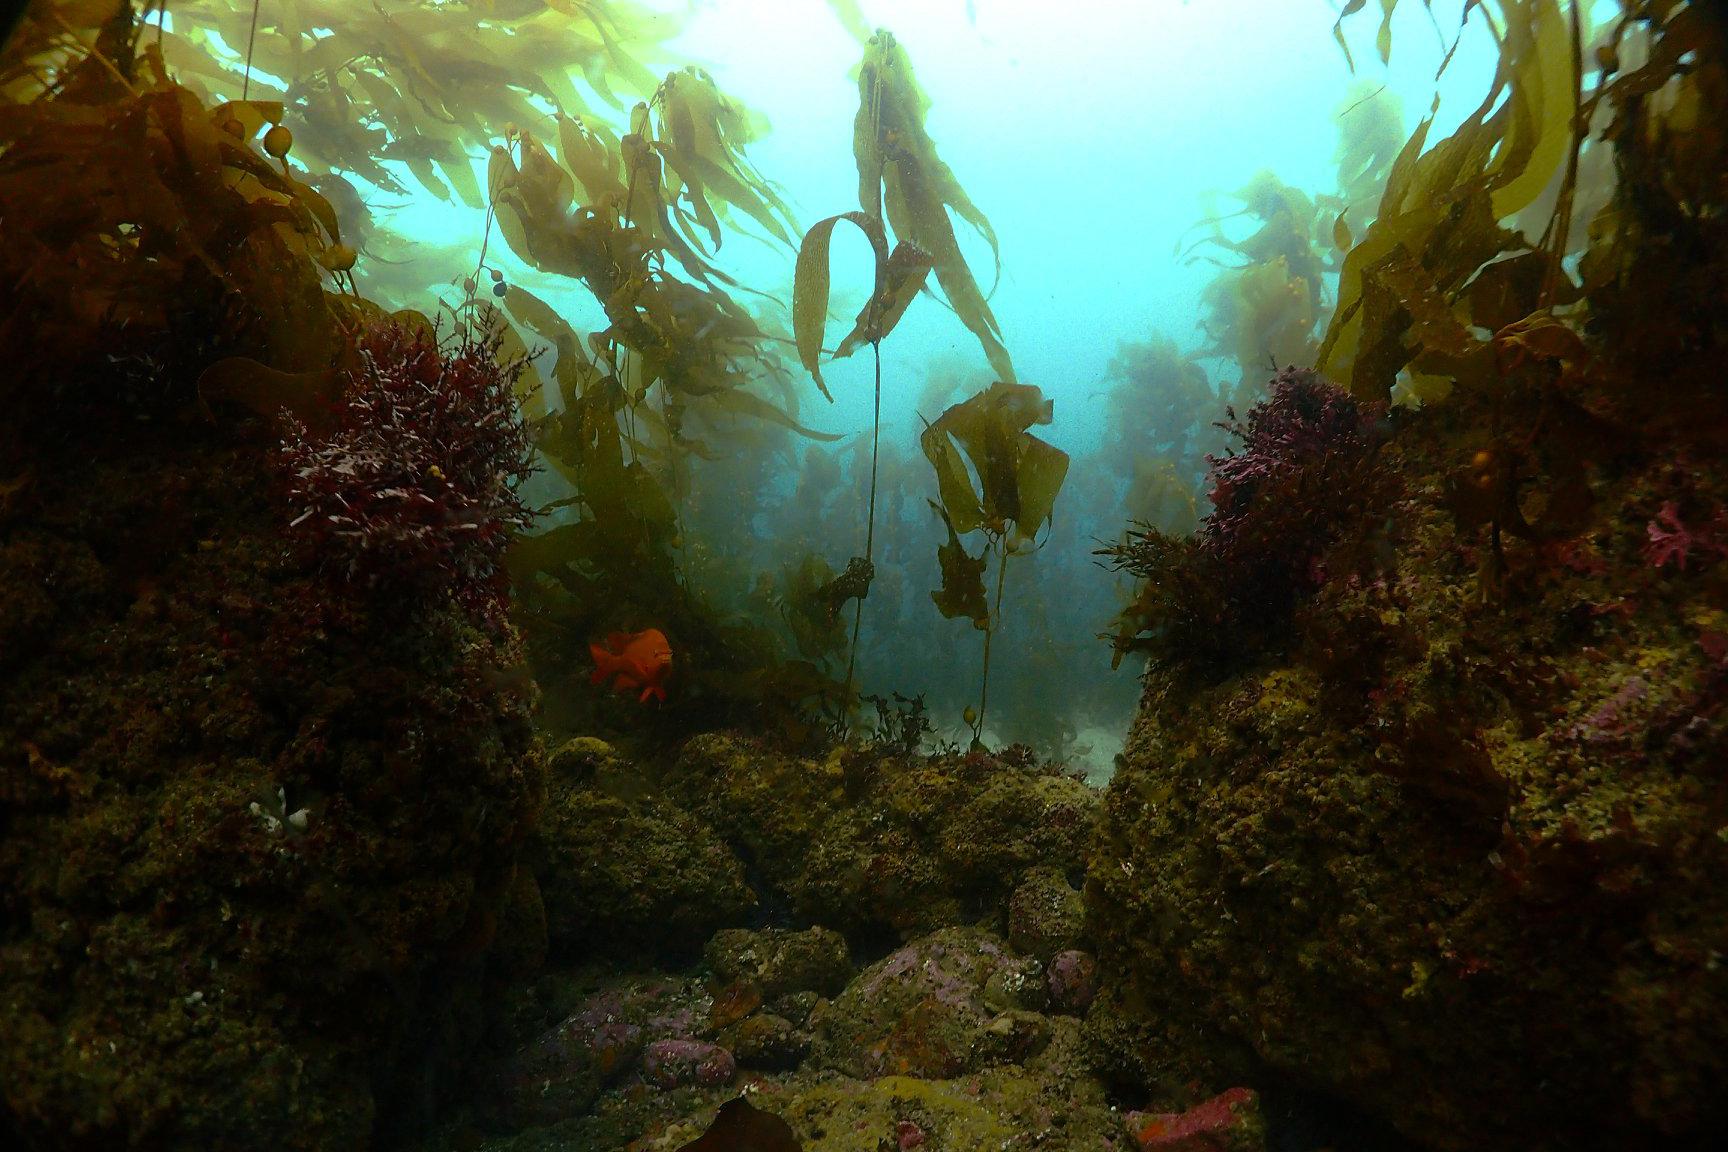 Healthy kelp forest habitat after restoration in California.